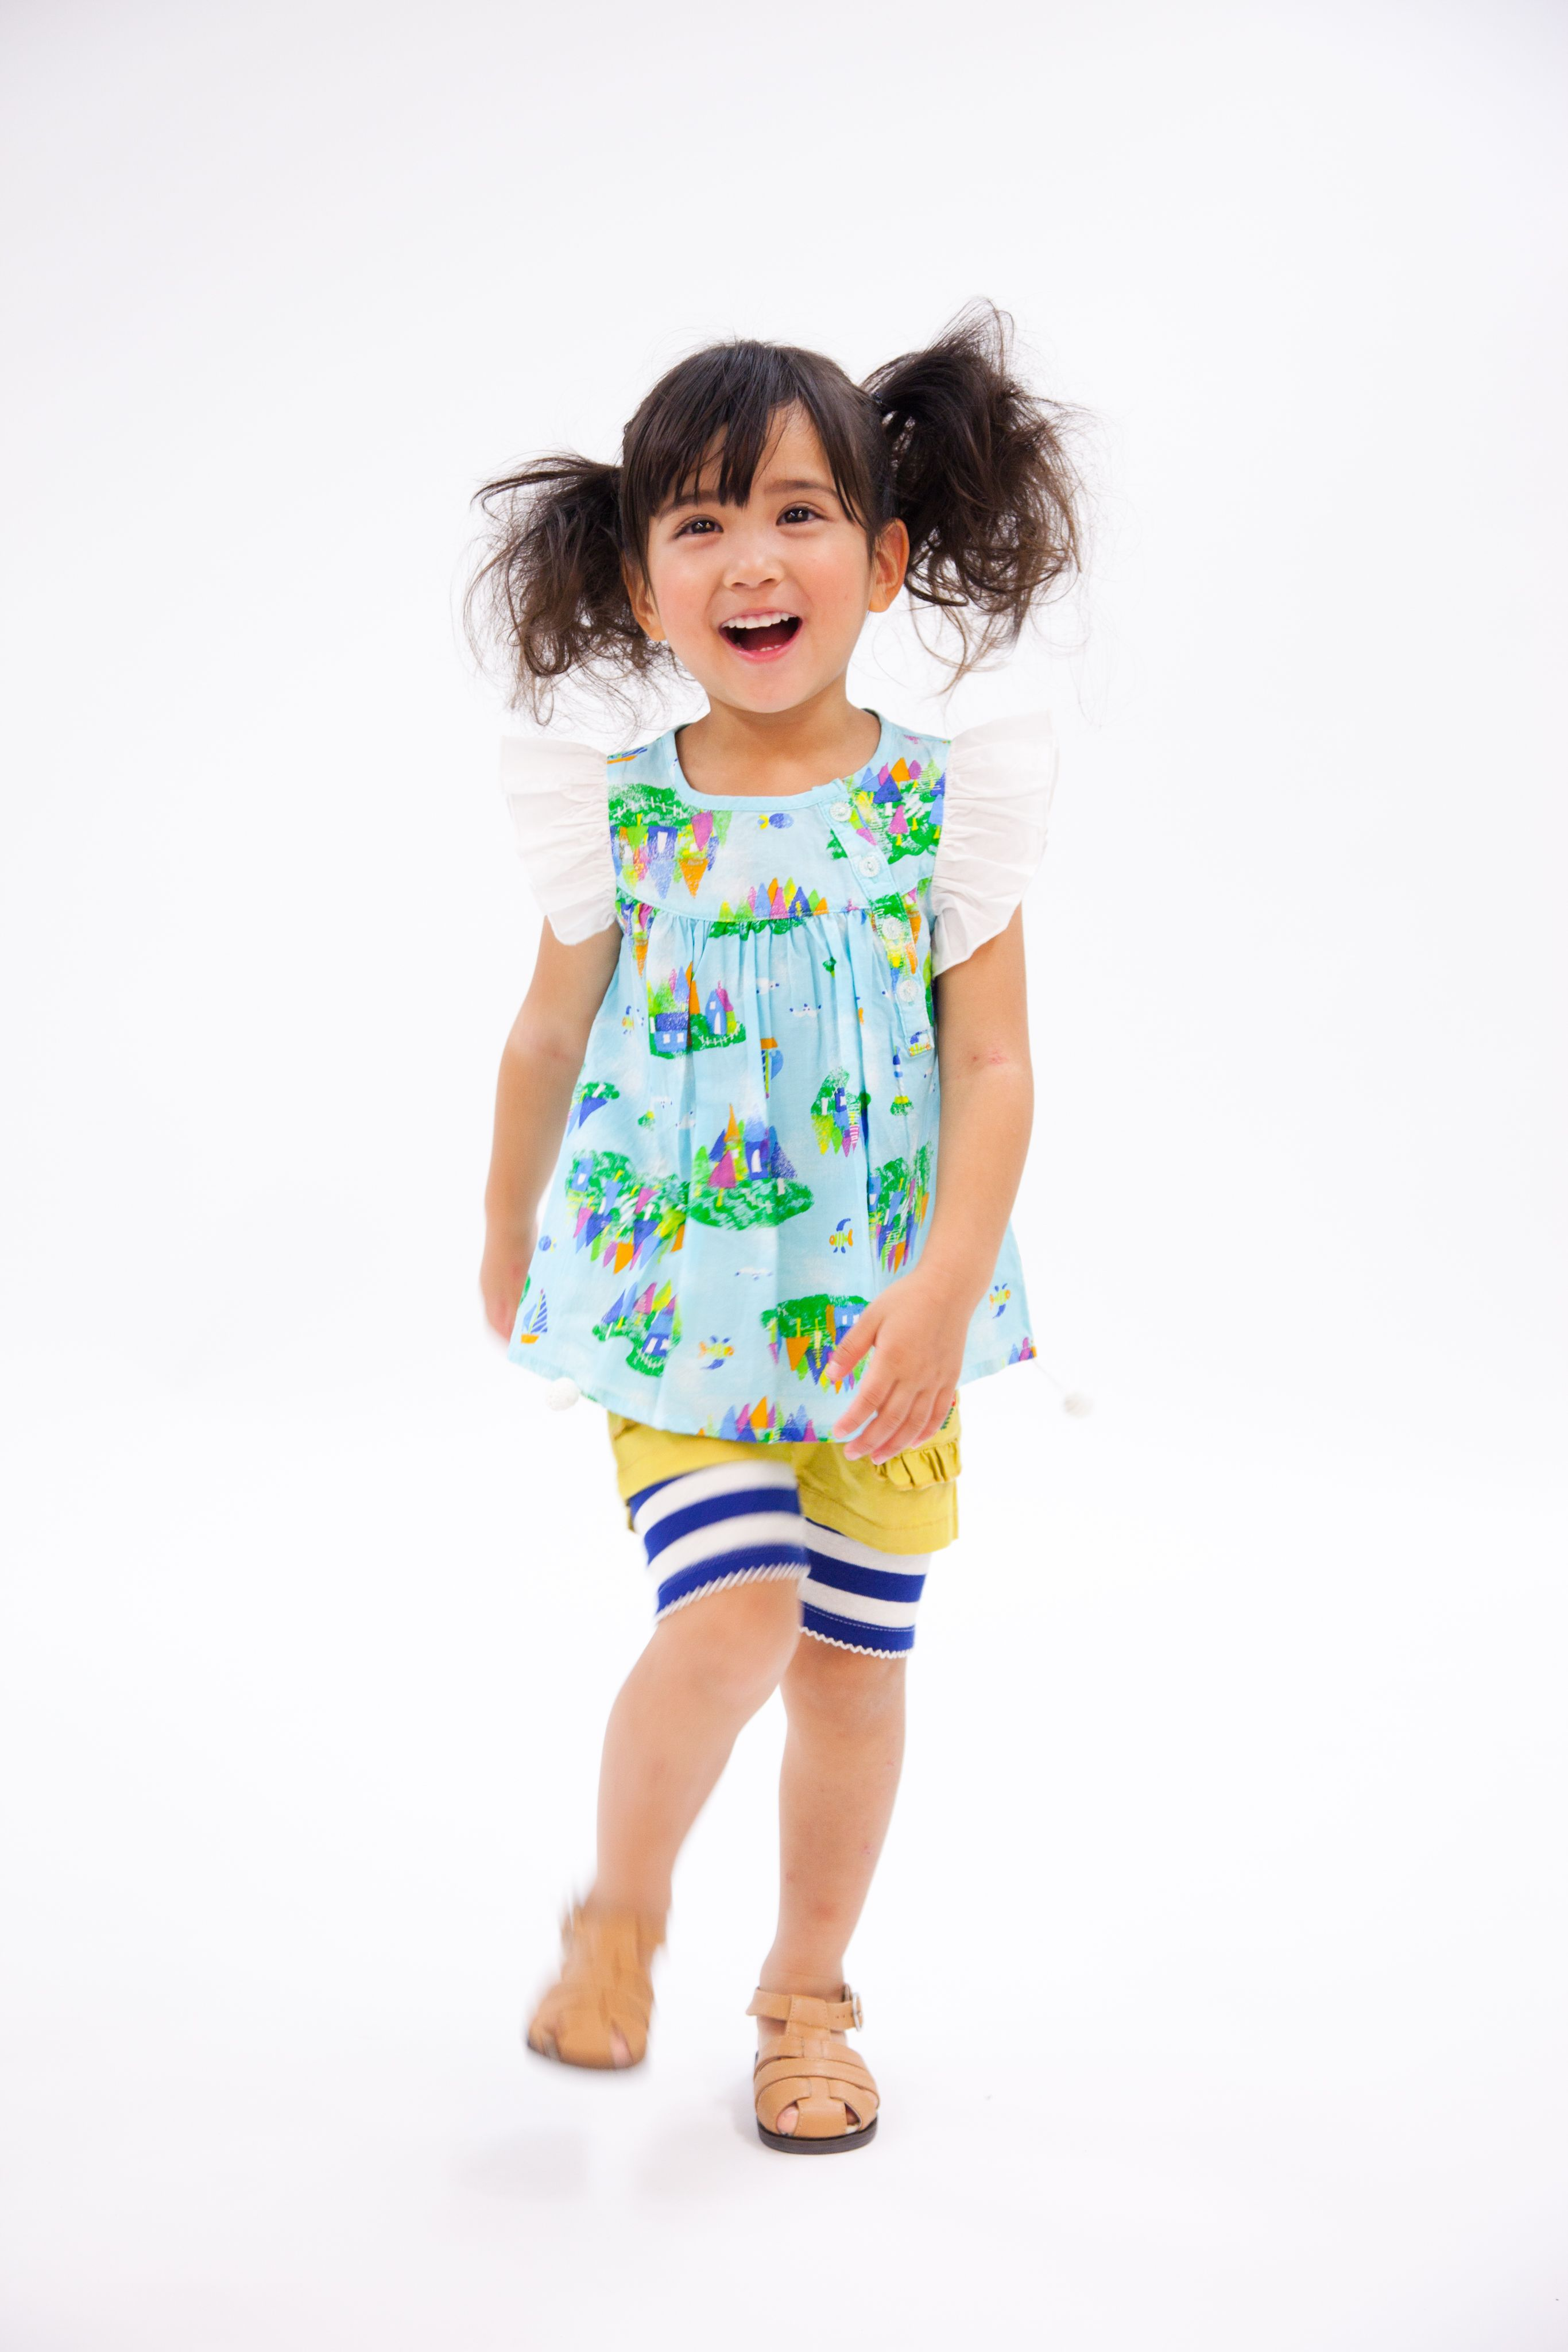 bitzkids fashion girls girlfashion kids summer colorful nyc